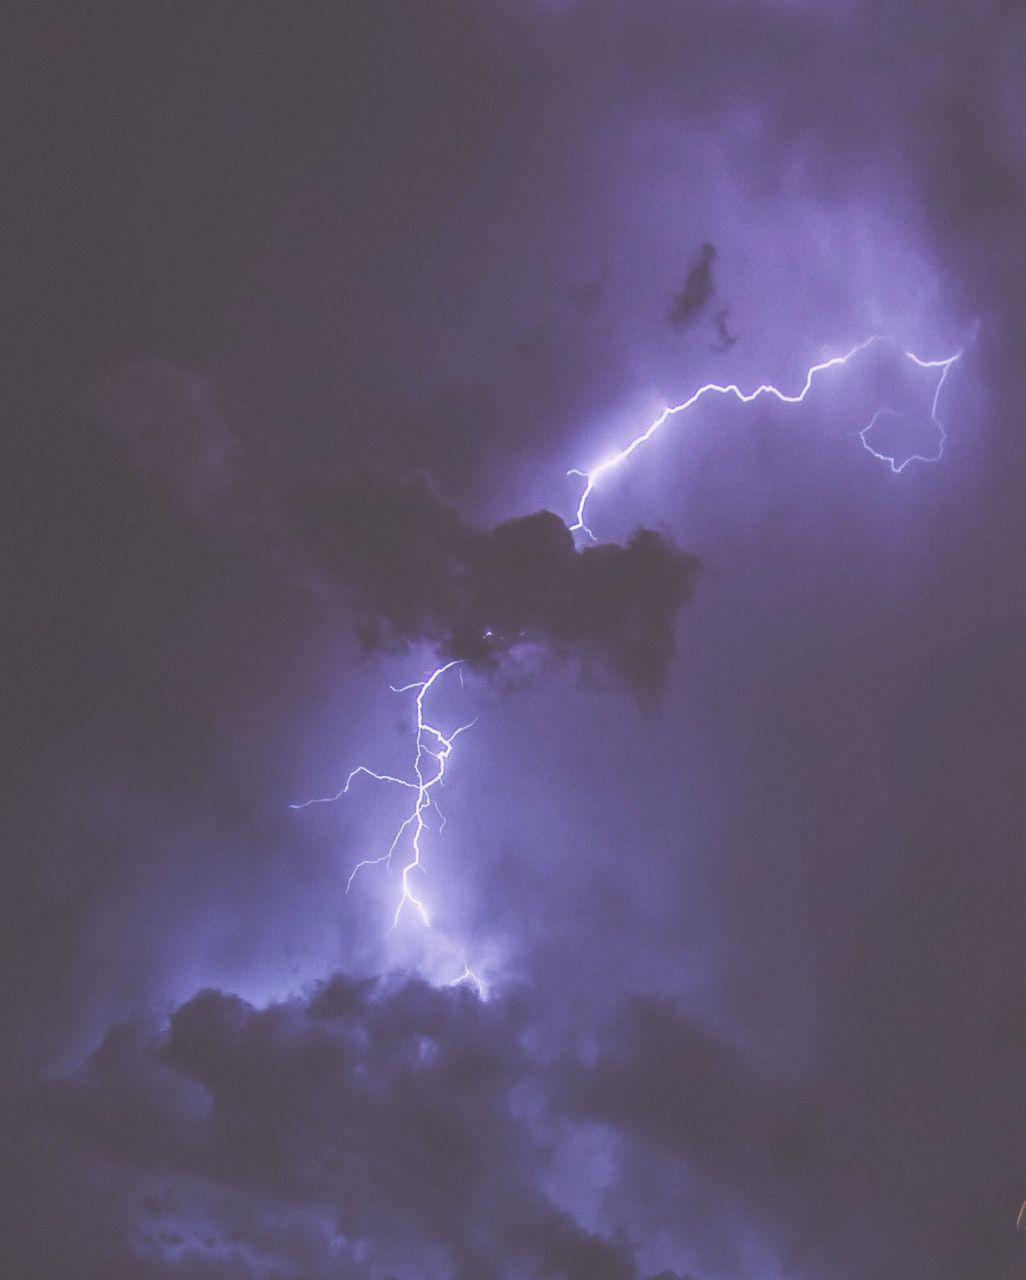 lightning aesthetic - Google Search